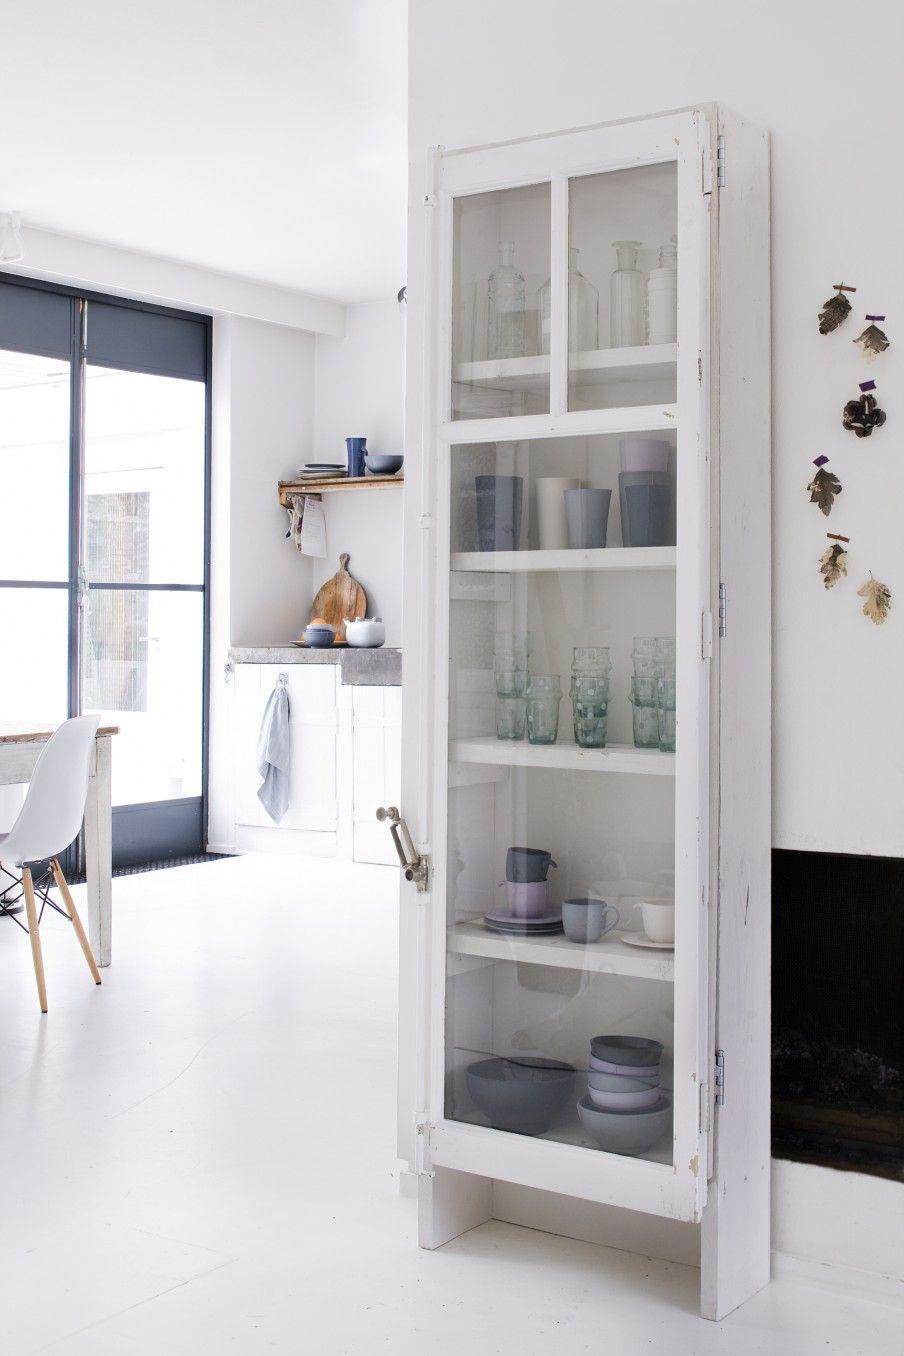 Vitrinekast Voor Keuken.Ondiepe Vitrinekast Maken For The Home Vitrinekasten Keuken